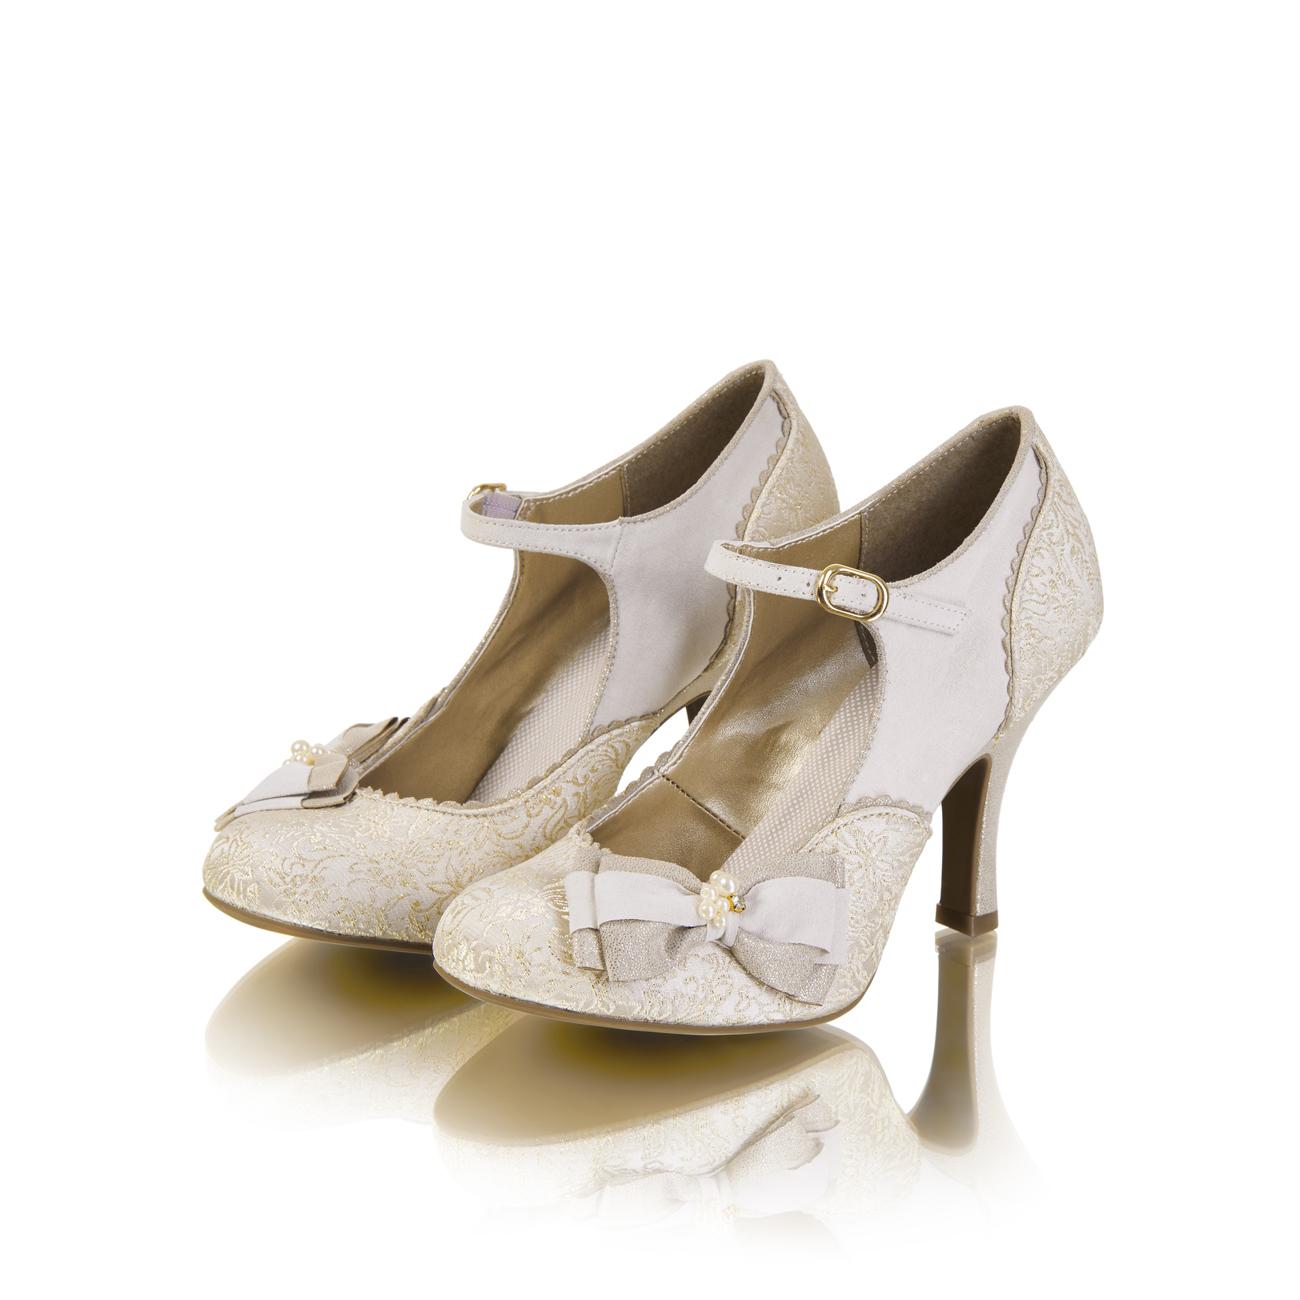 Ruby Shoo Maria Mary Jane Bow Schuhes UK3-9 EU36-42 Cream Bridal WEISS Silver Gold Cream EU36-42 392422